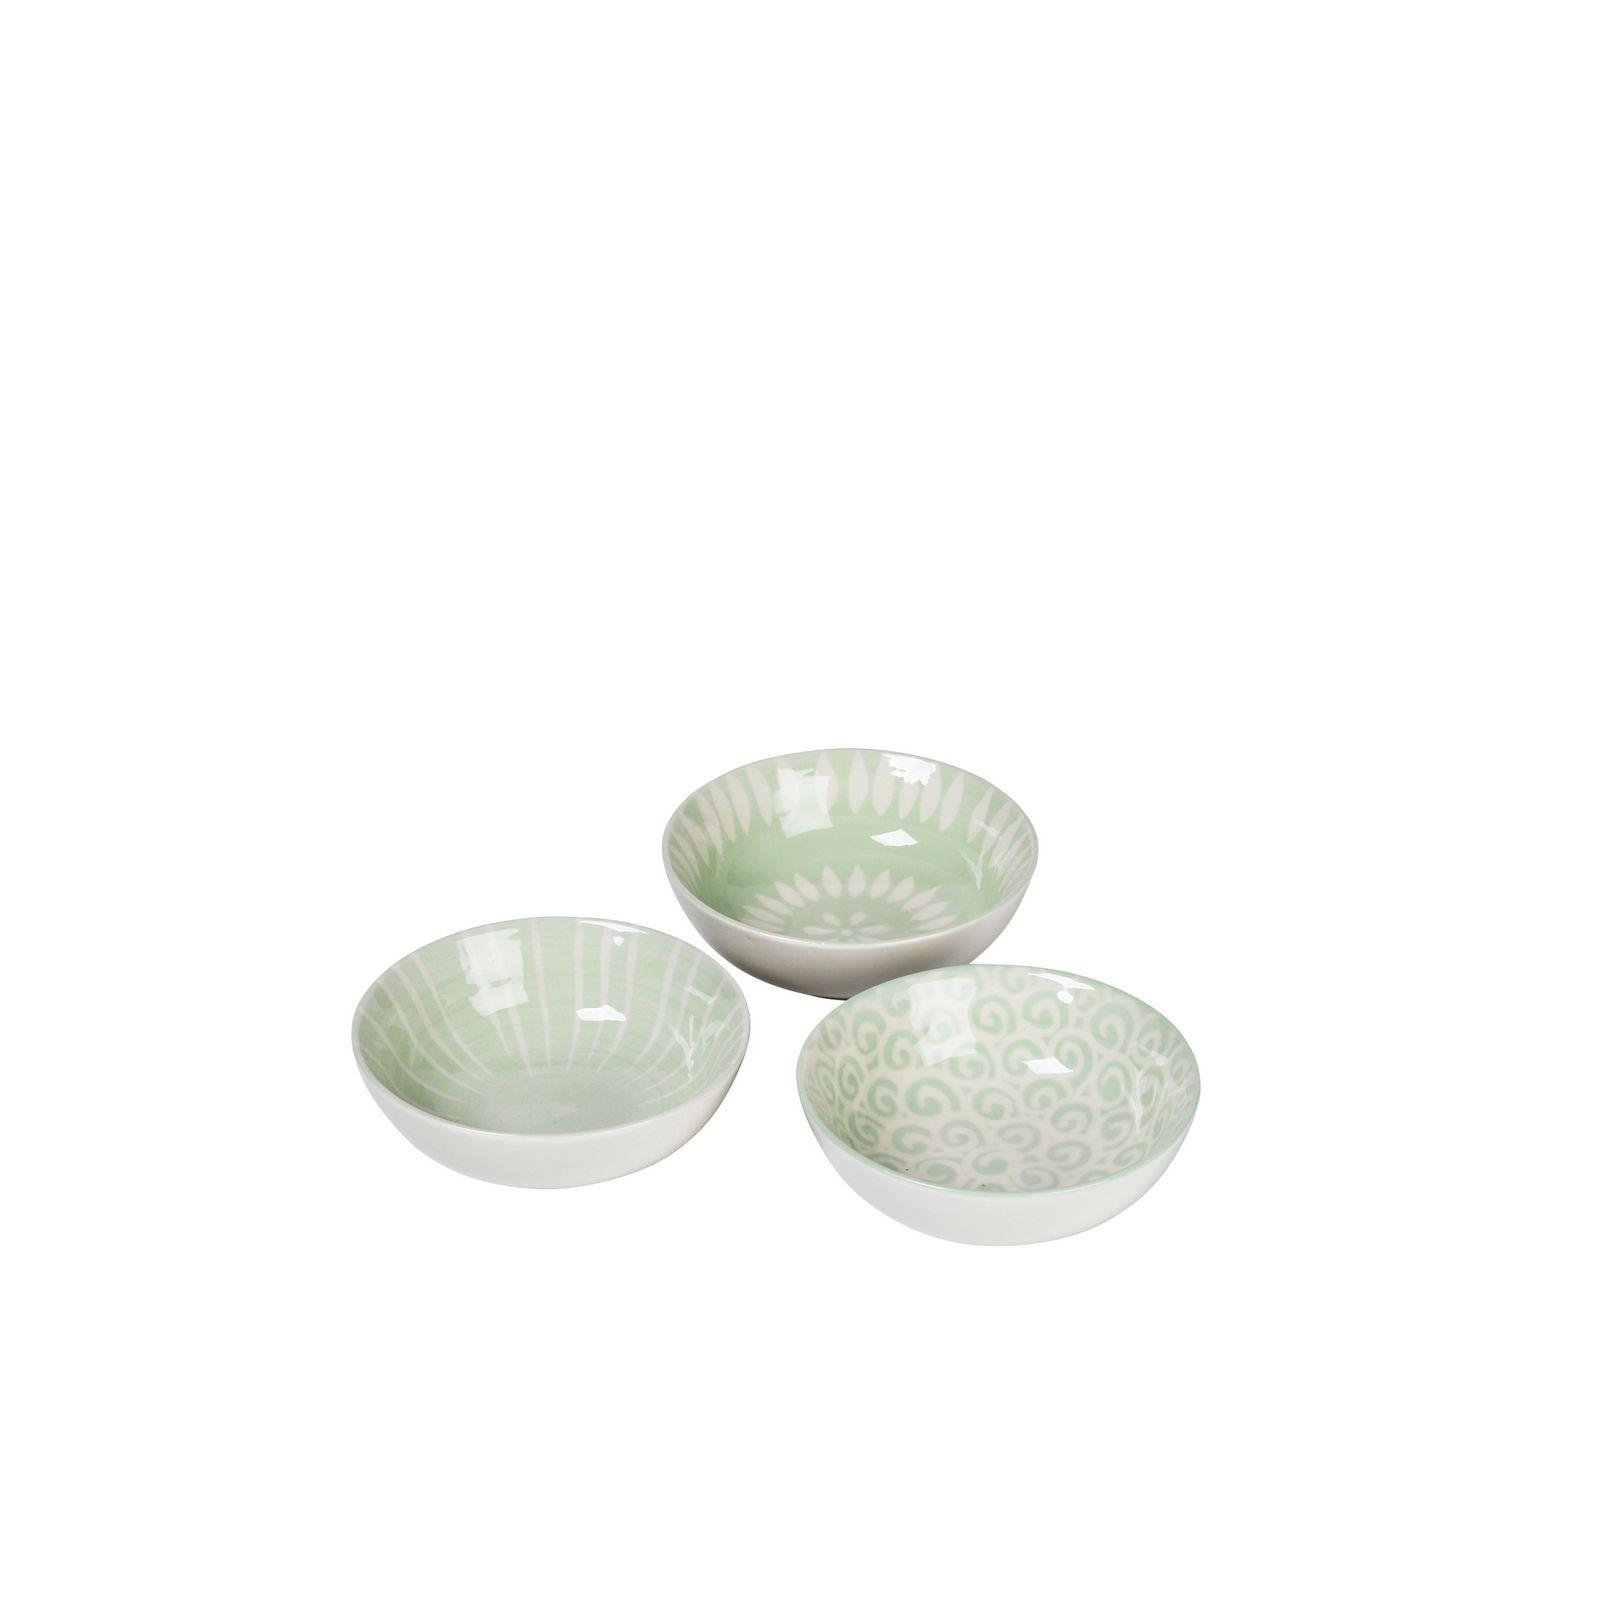 Набор мисок Broste Modern, цвет: белый, зеленый, 13х13х4,5 см, 3 шт. 14533054